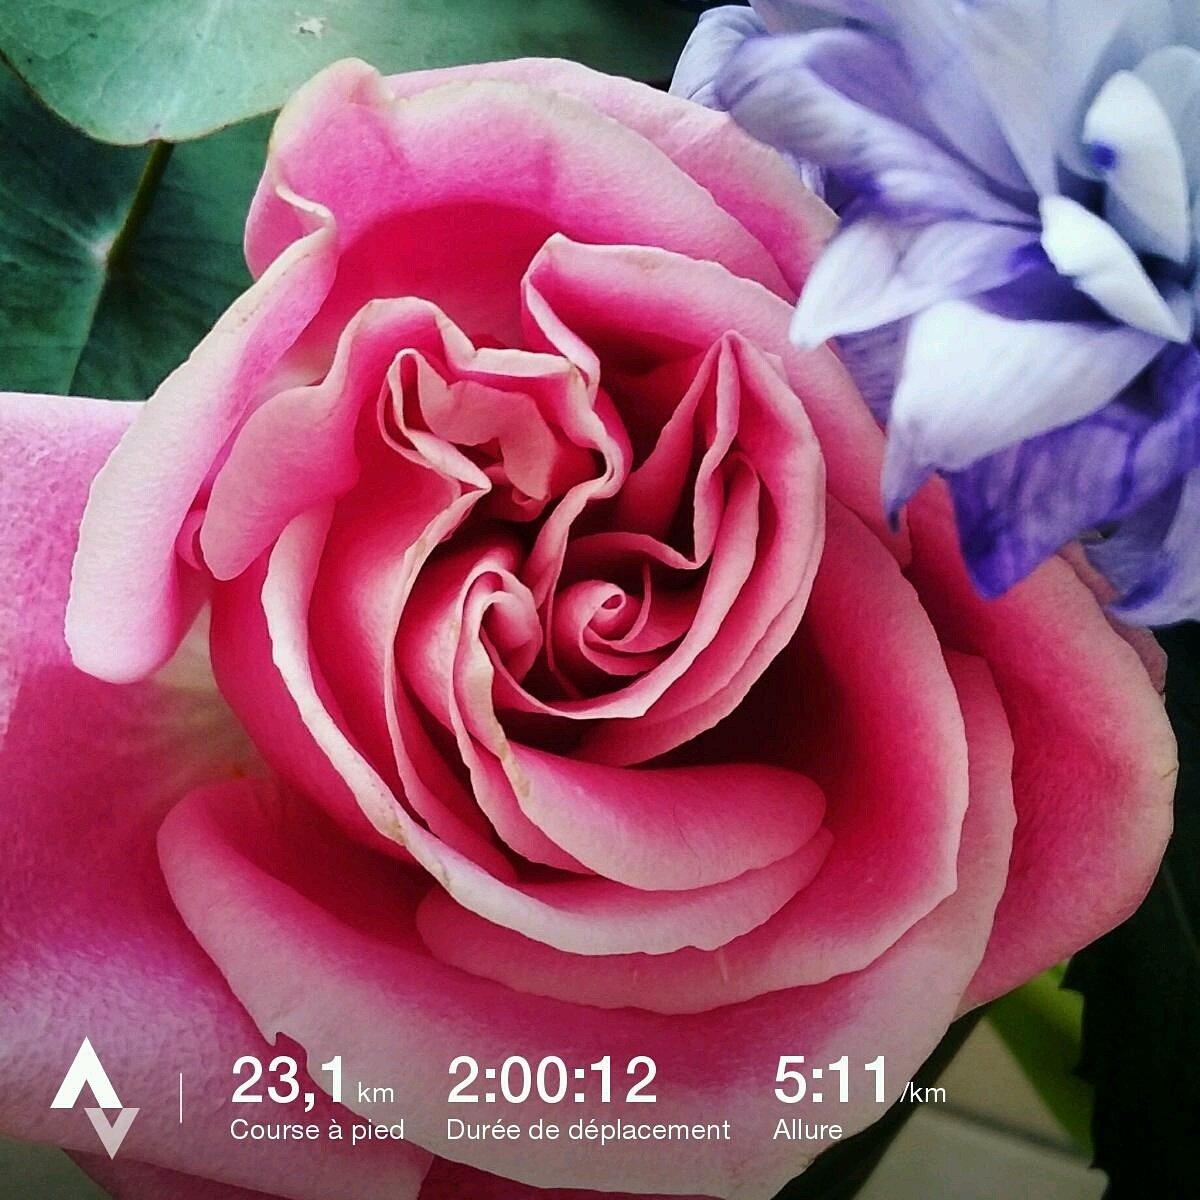 Deniers sortie longue avant le #marathon ! #whyirunbirhakeim #whyirunparis<br>http://pic.twitter.com/eTnuS5LVzk